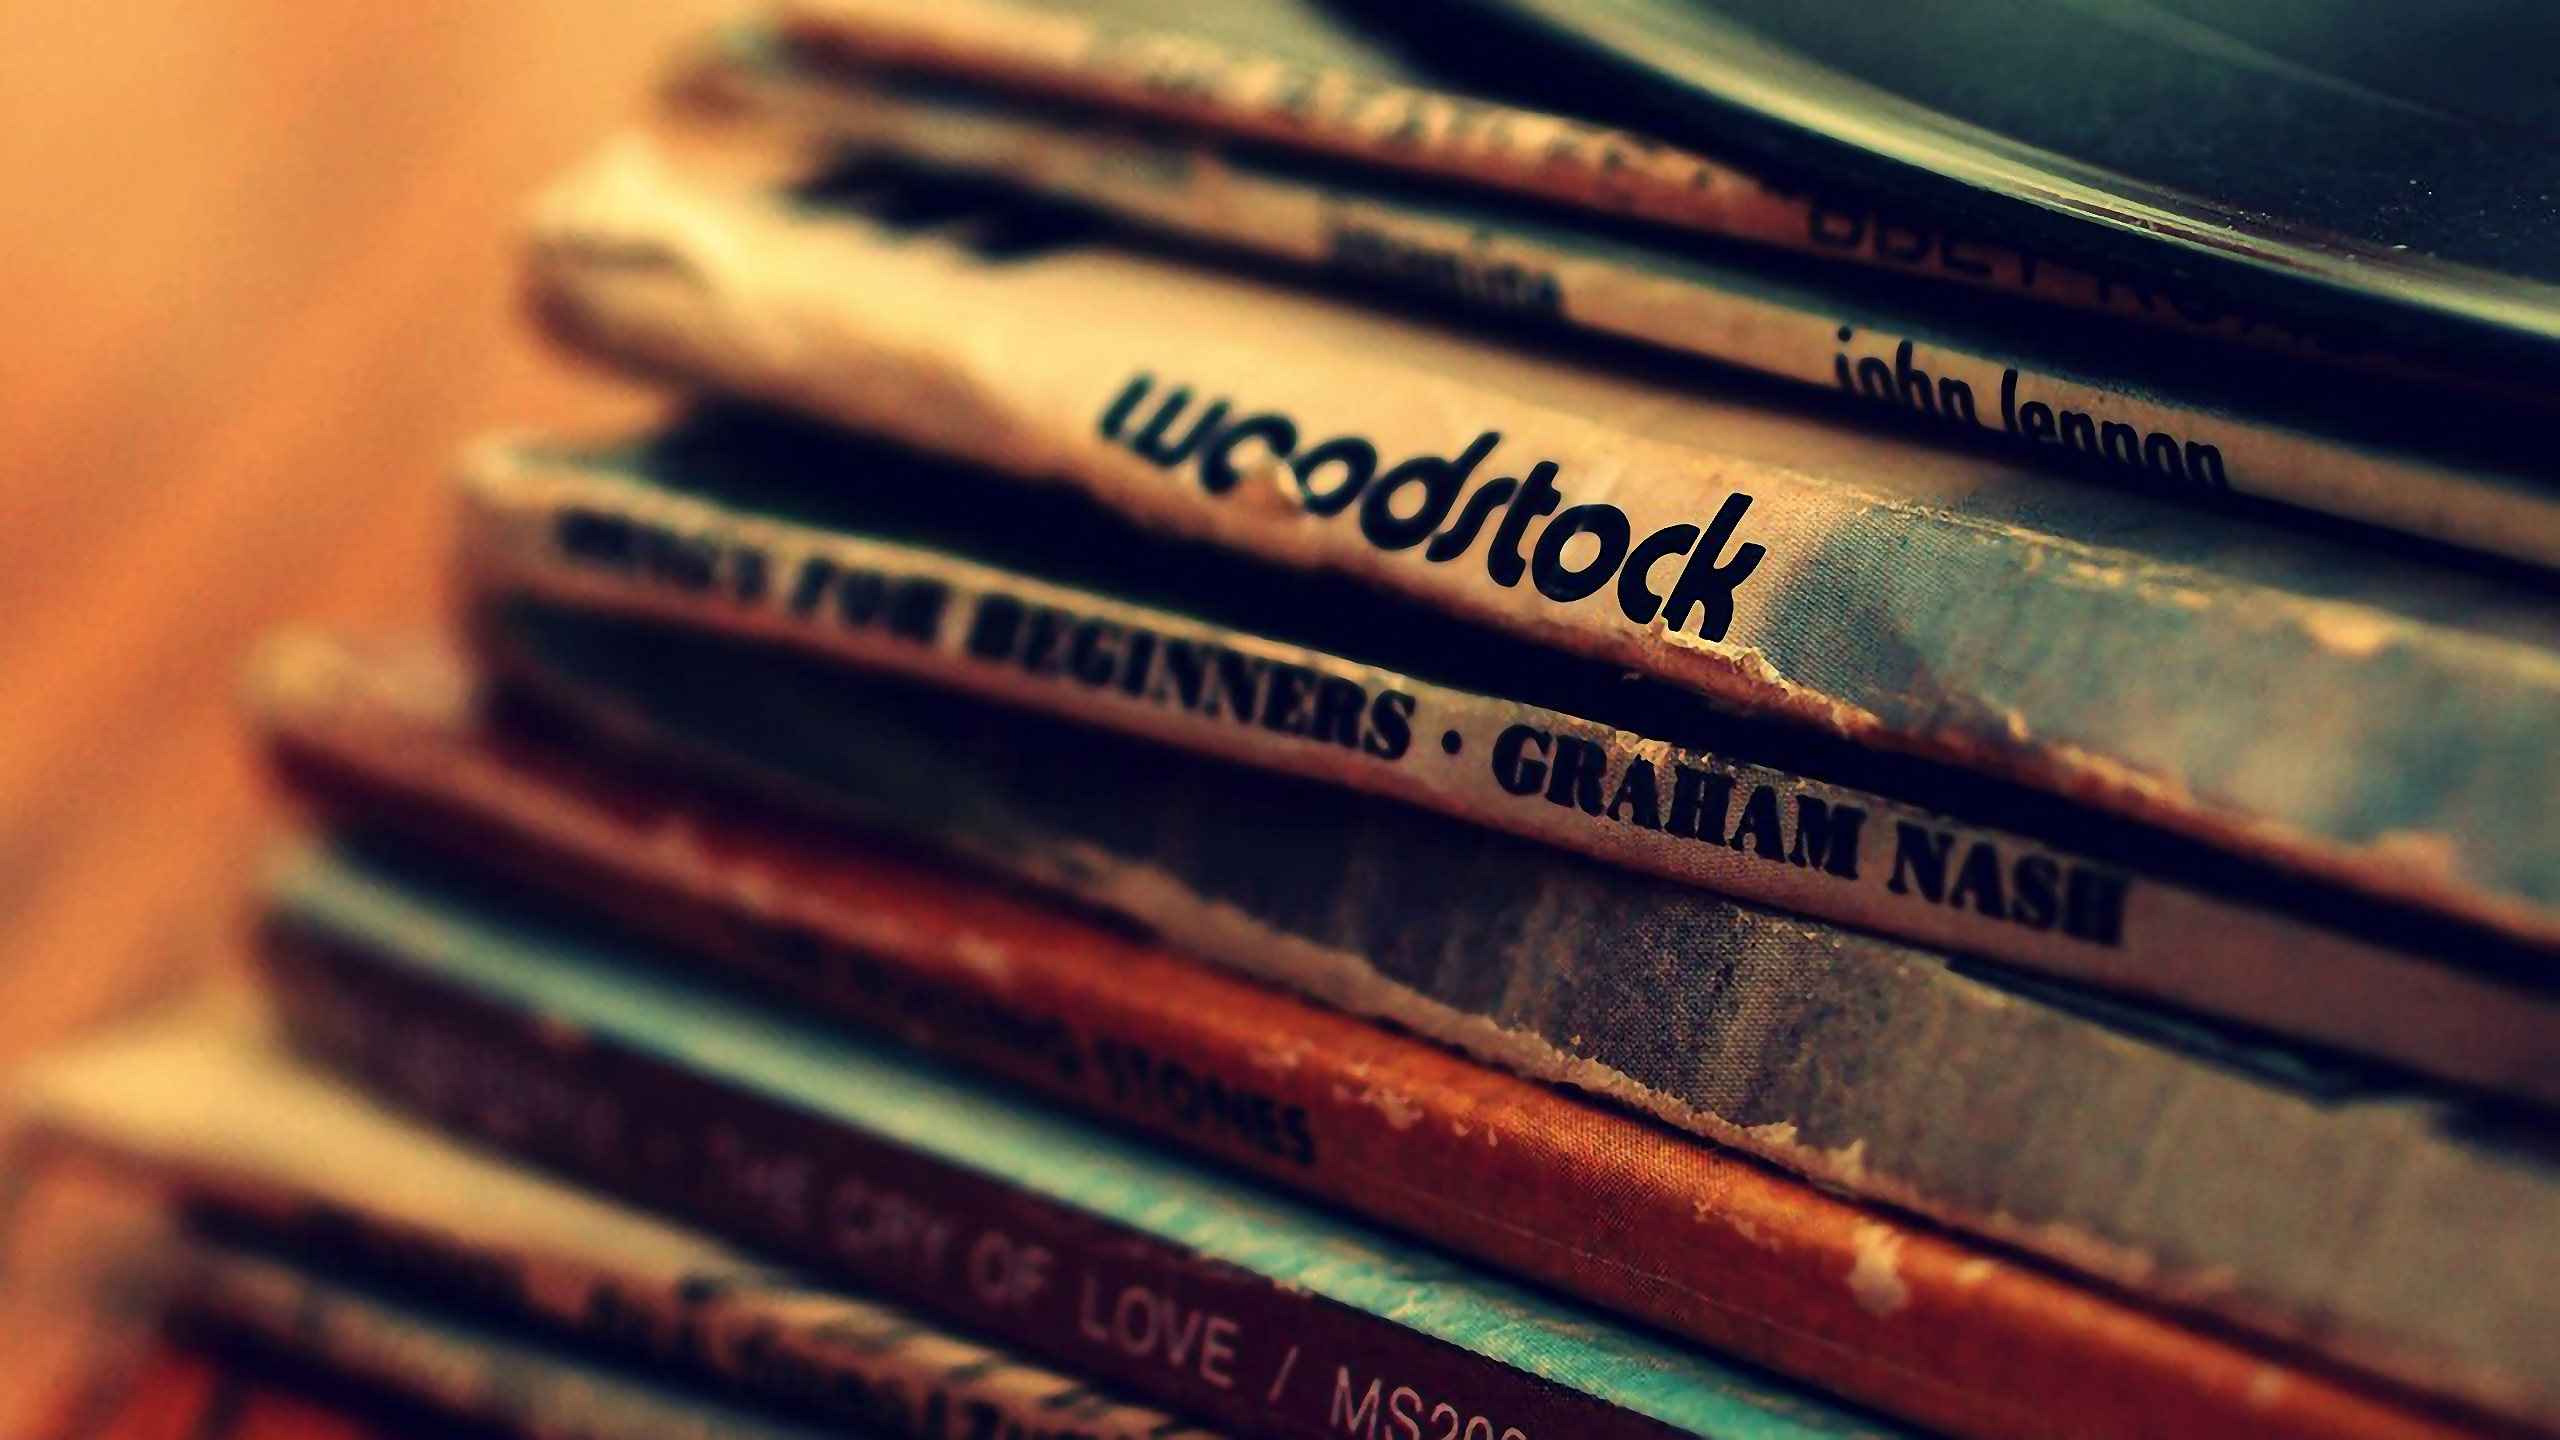 Book Cover Background Music : Music record vinyl woodstock wallpaper